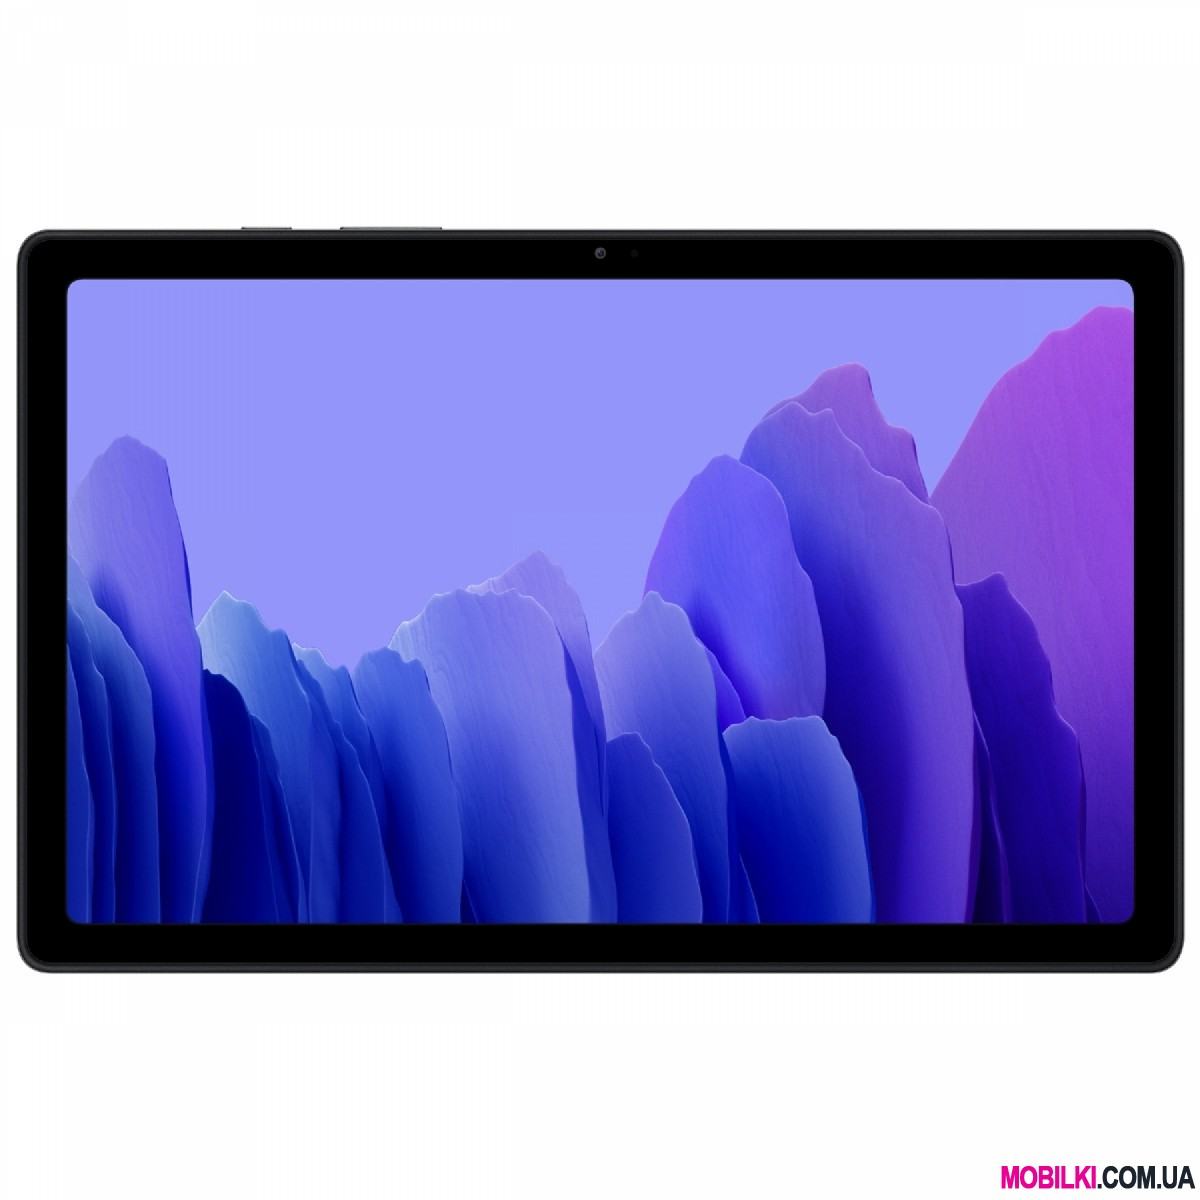 Samsung Tab A7 10.4 Wi-Fi (SM-T500)